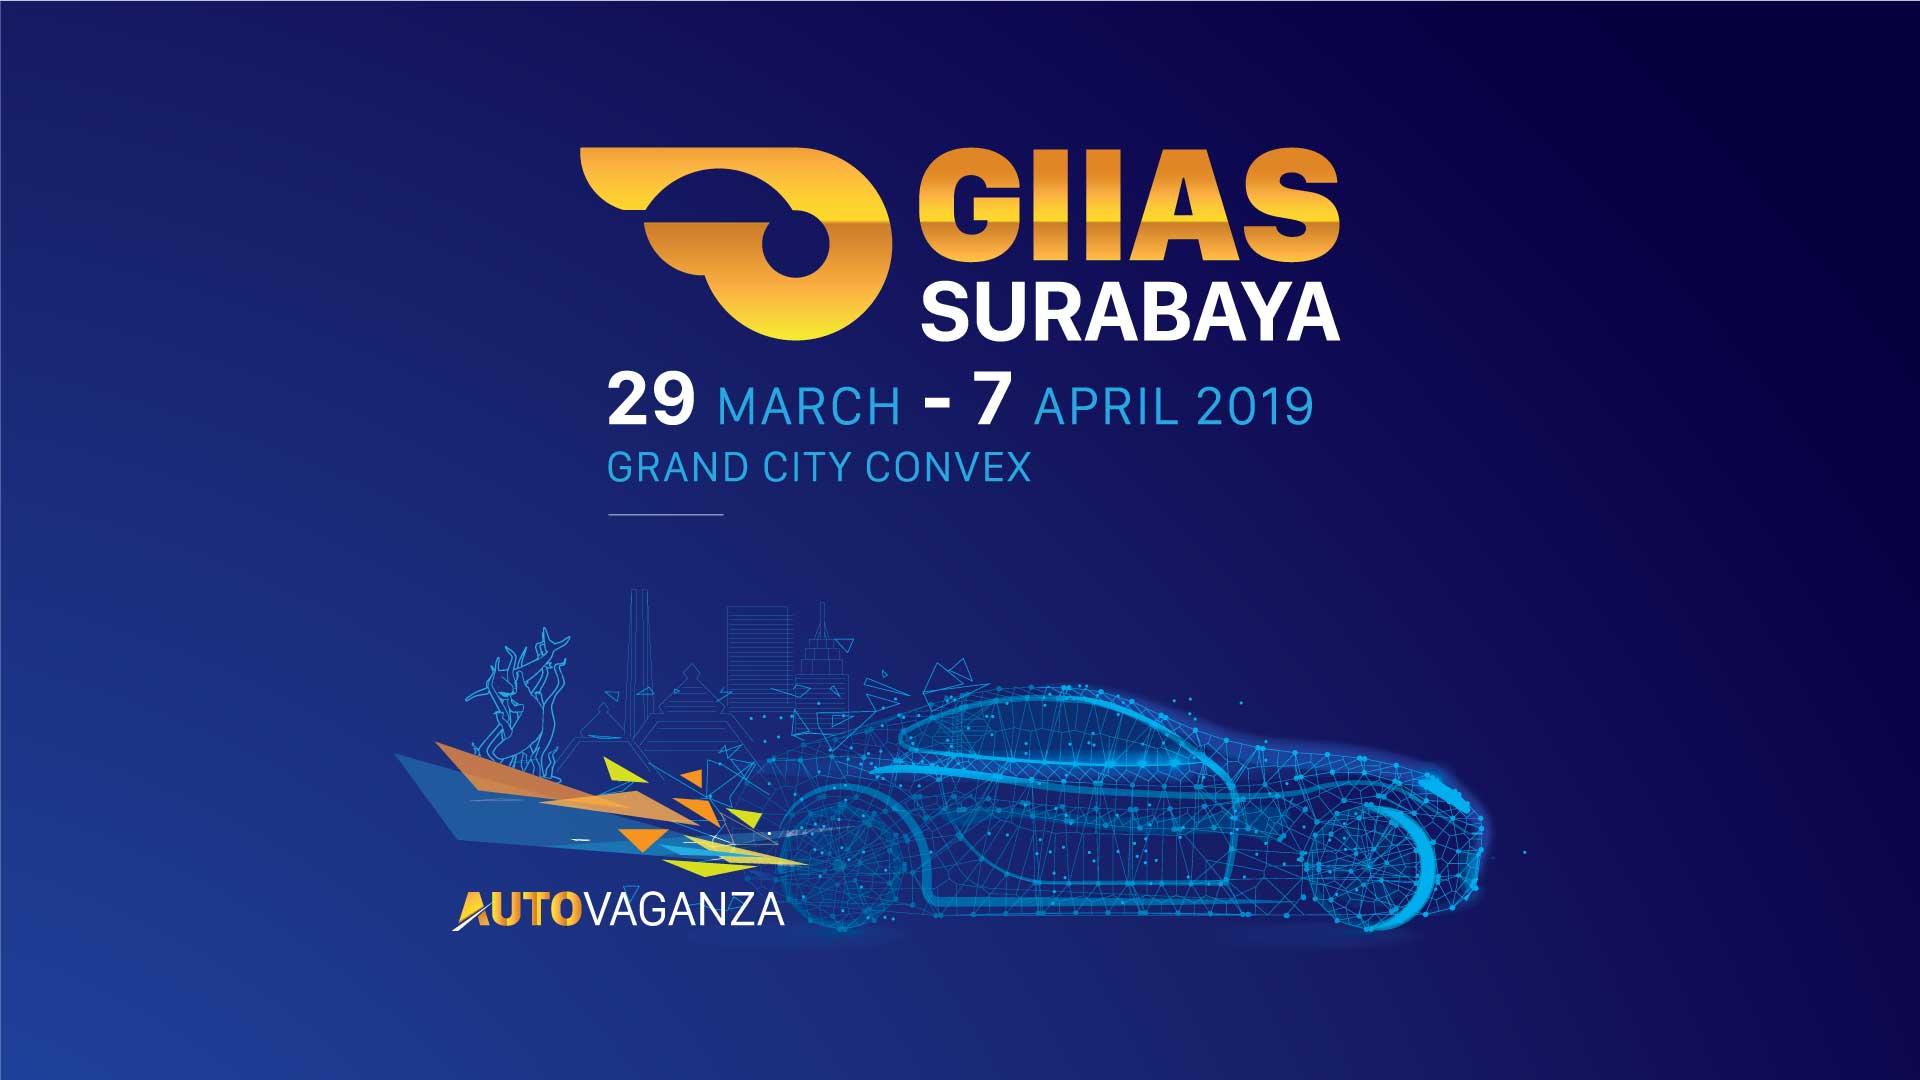 GIIAS Surabaya